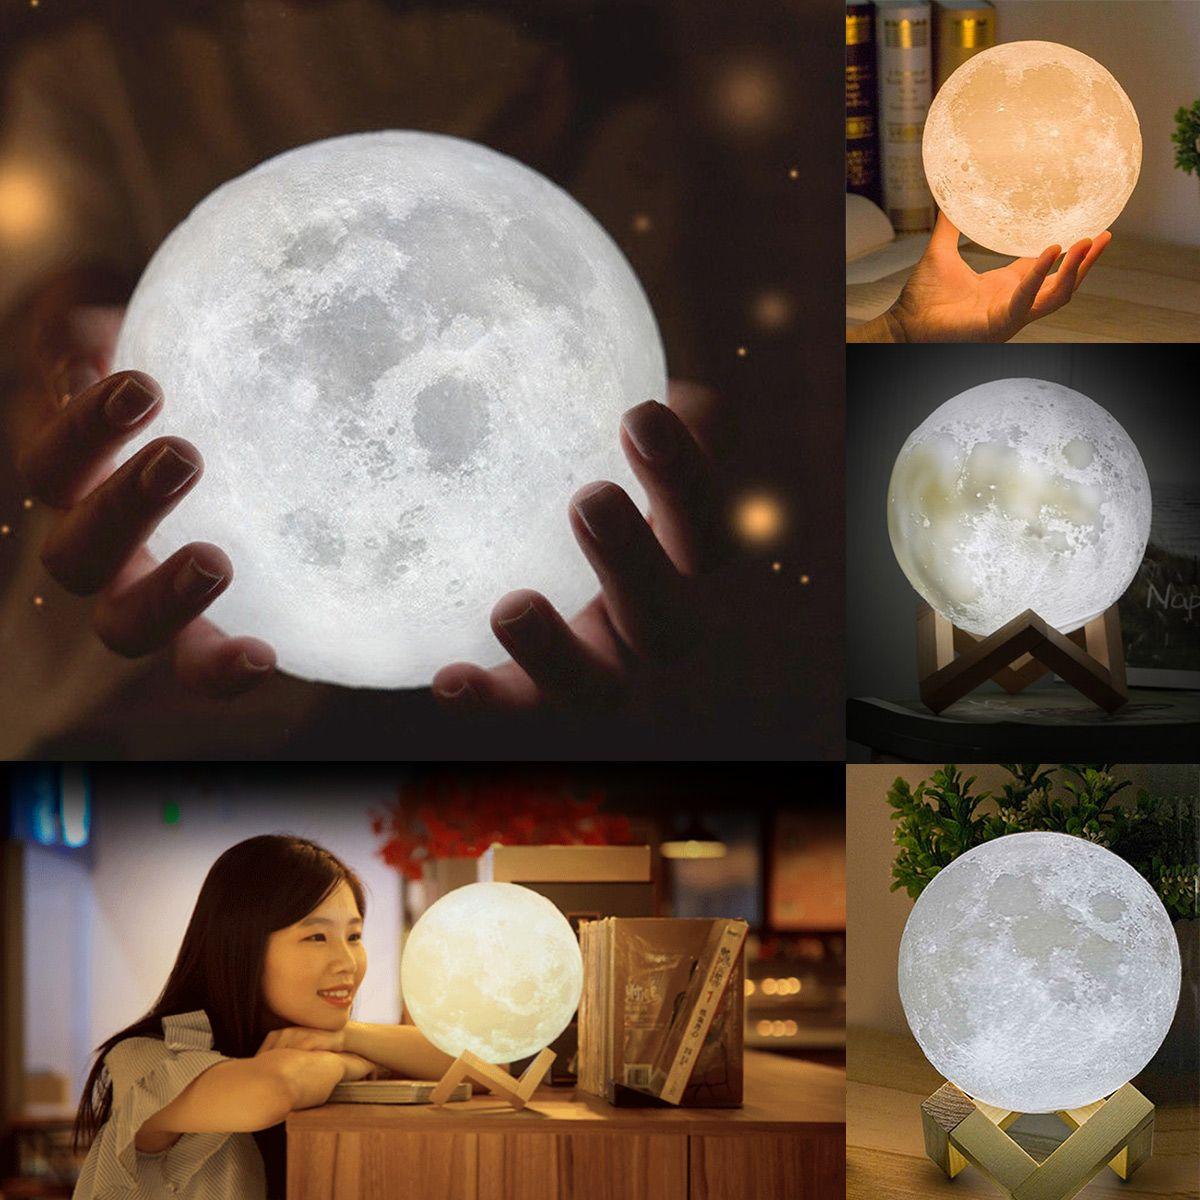 Moon Lamp Led Night Light Night Light Lamp Light